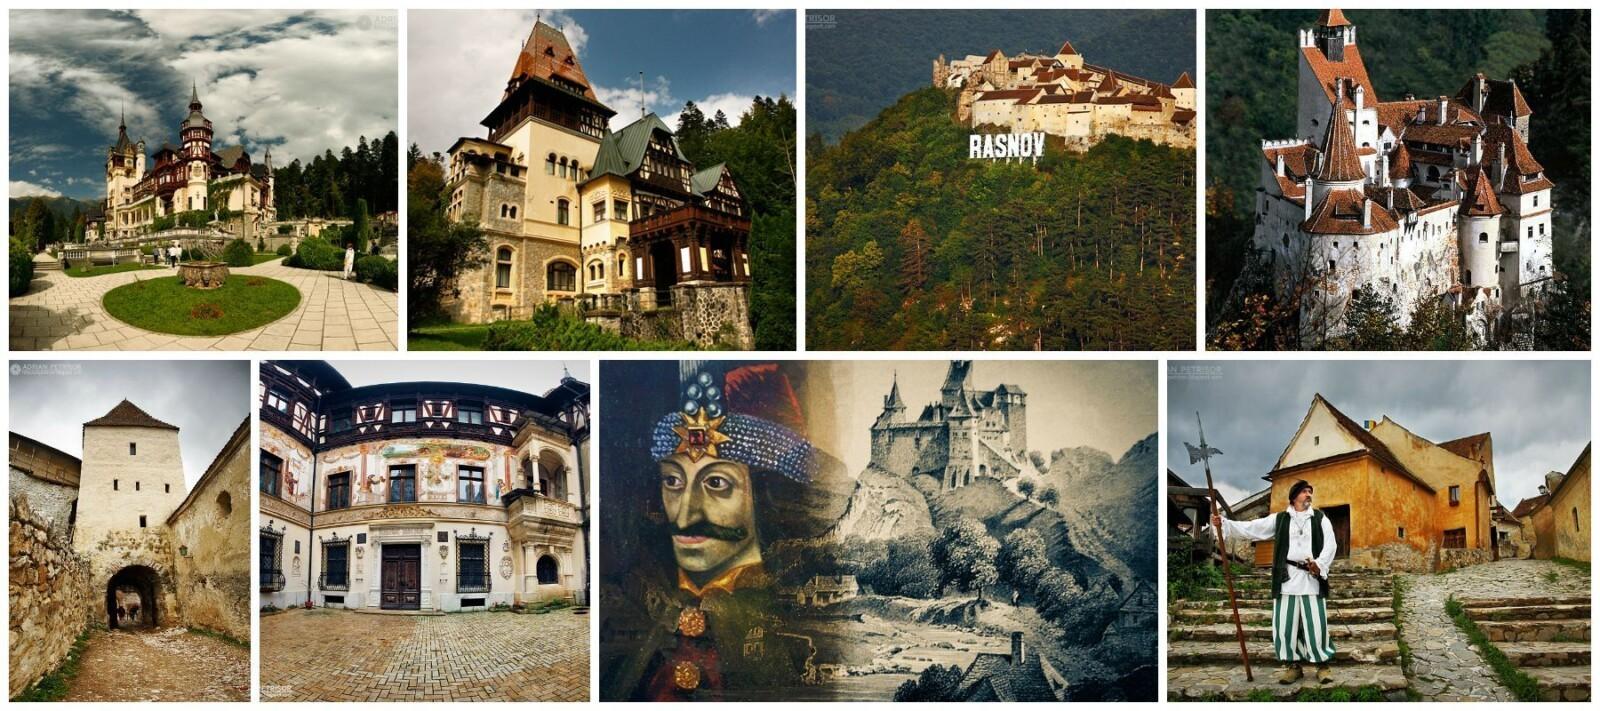 Castles trips, one day trip, Peles, Pelisor, Bran, Rasnov